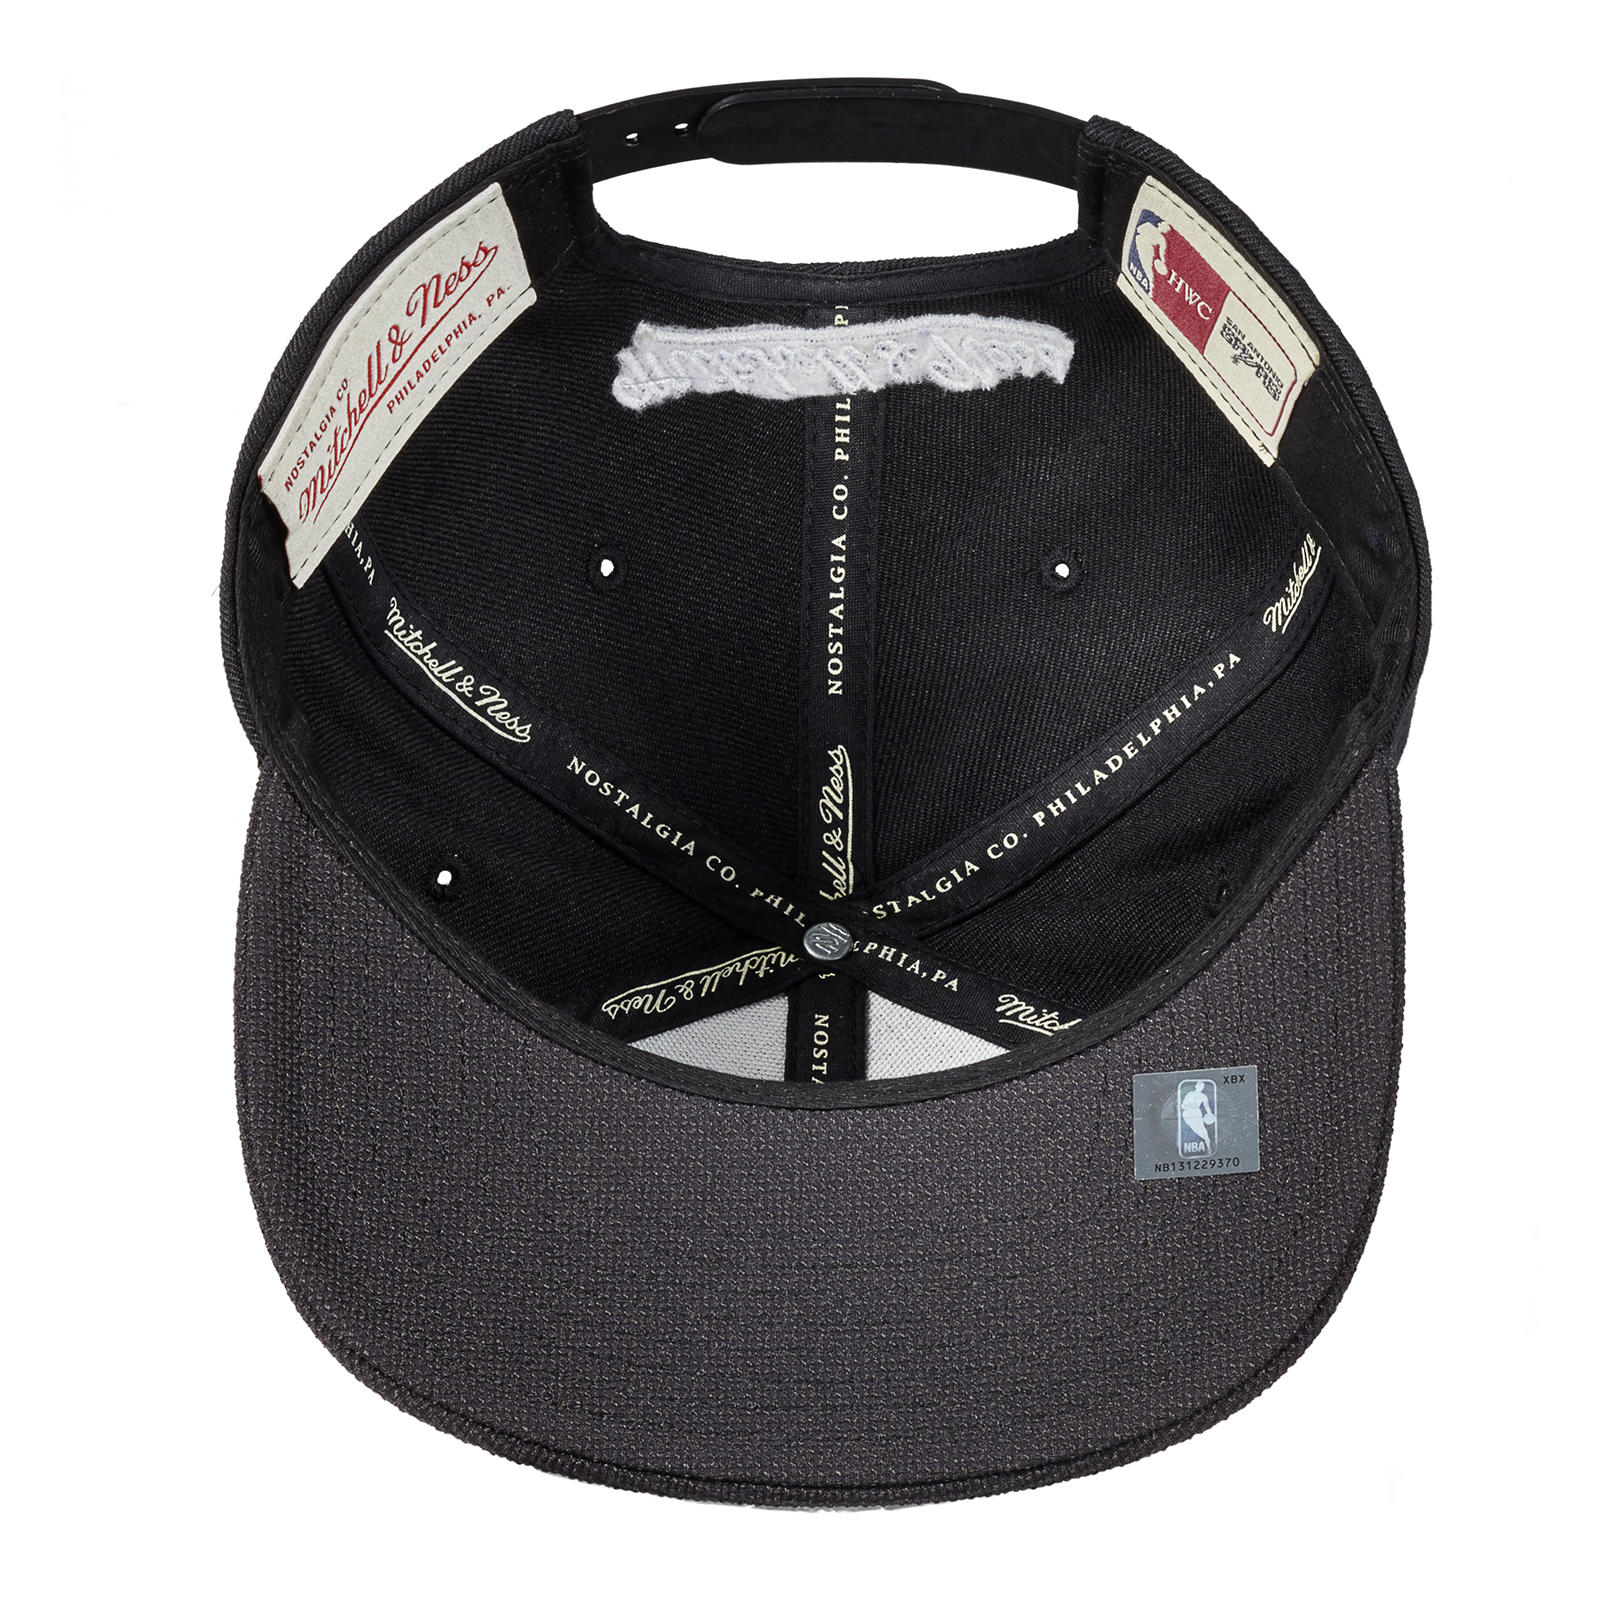 huge discount 57c69 a8398 Mitchell   Ness Nostalgia Co.   Full Dollar Snapback - San Antonio Spurs